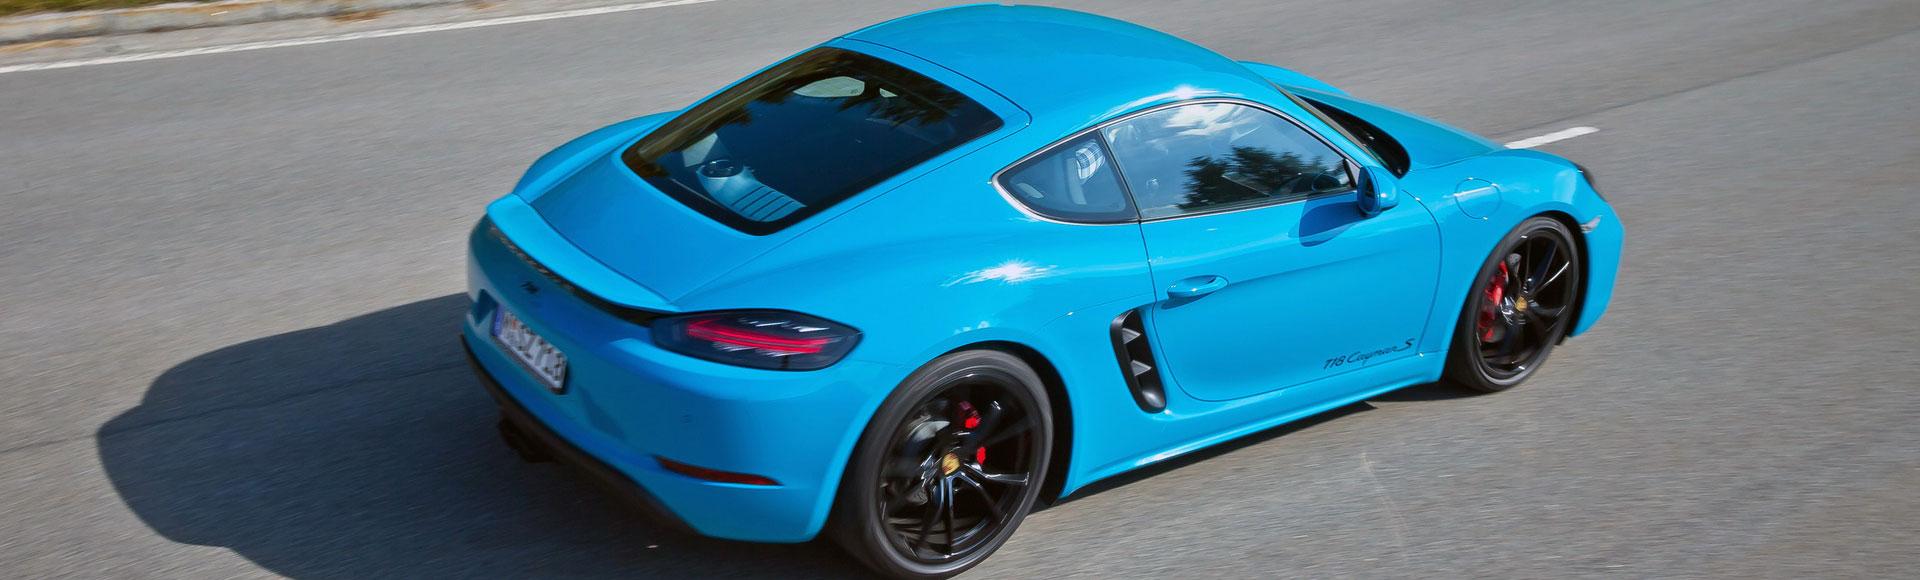 Porsche 718 Cayman 2016 365 Sommer Herbst